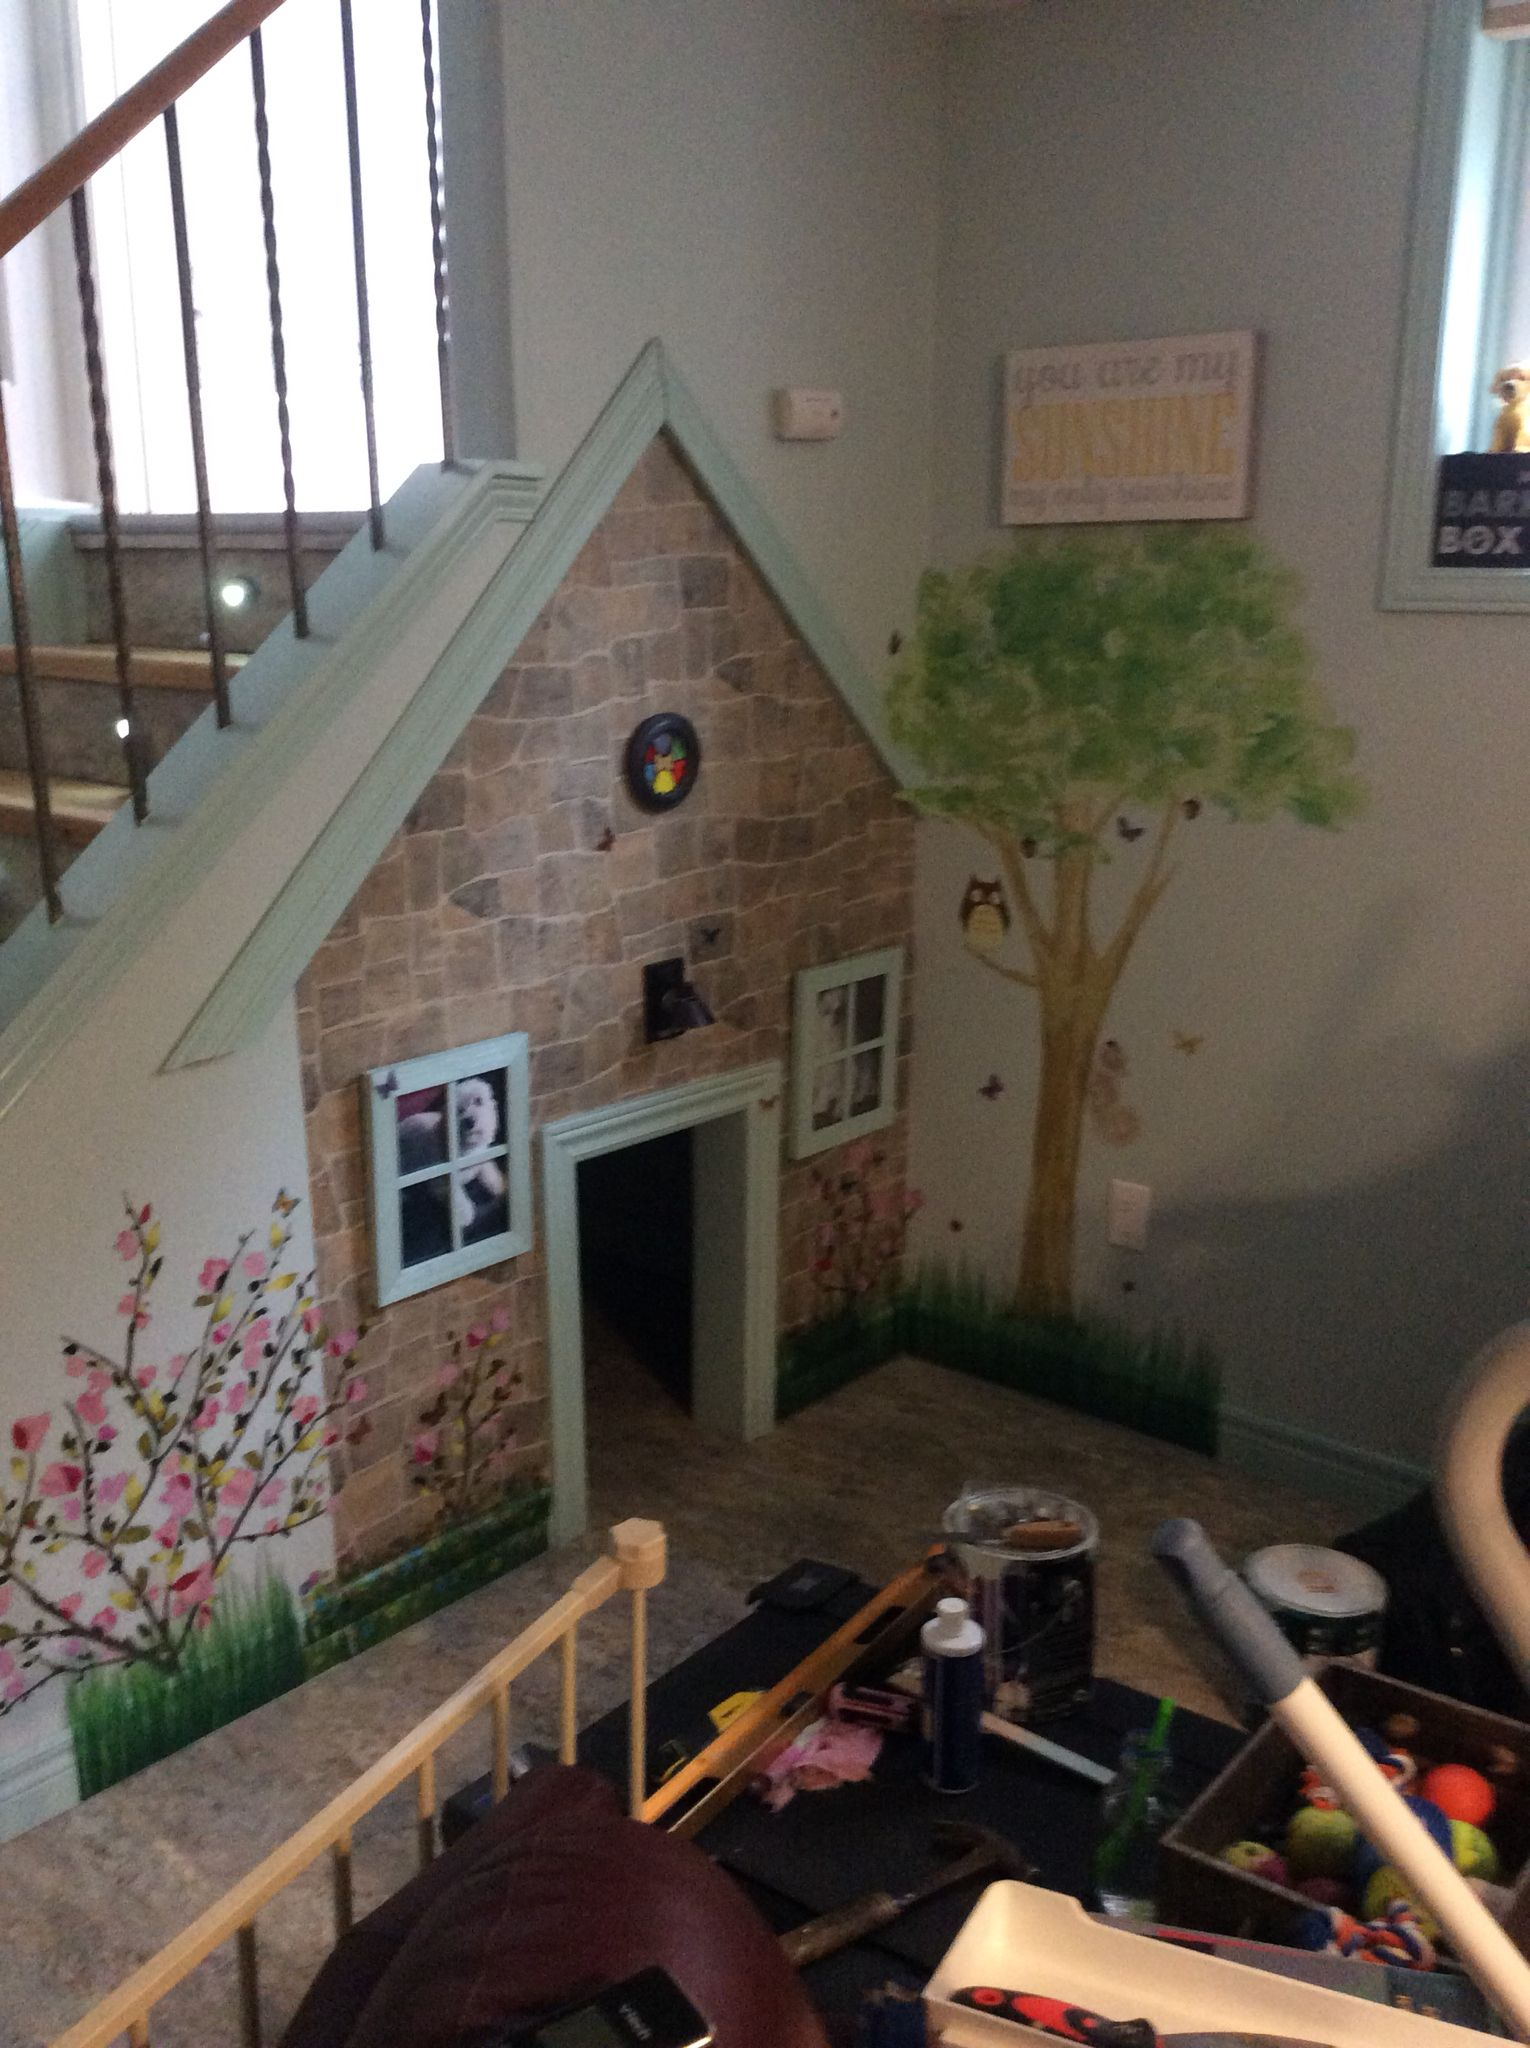 Dog House Under The Stairs Avec Images Lit Chien Maison Deco